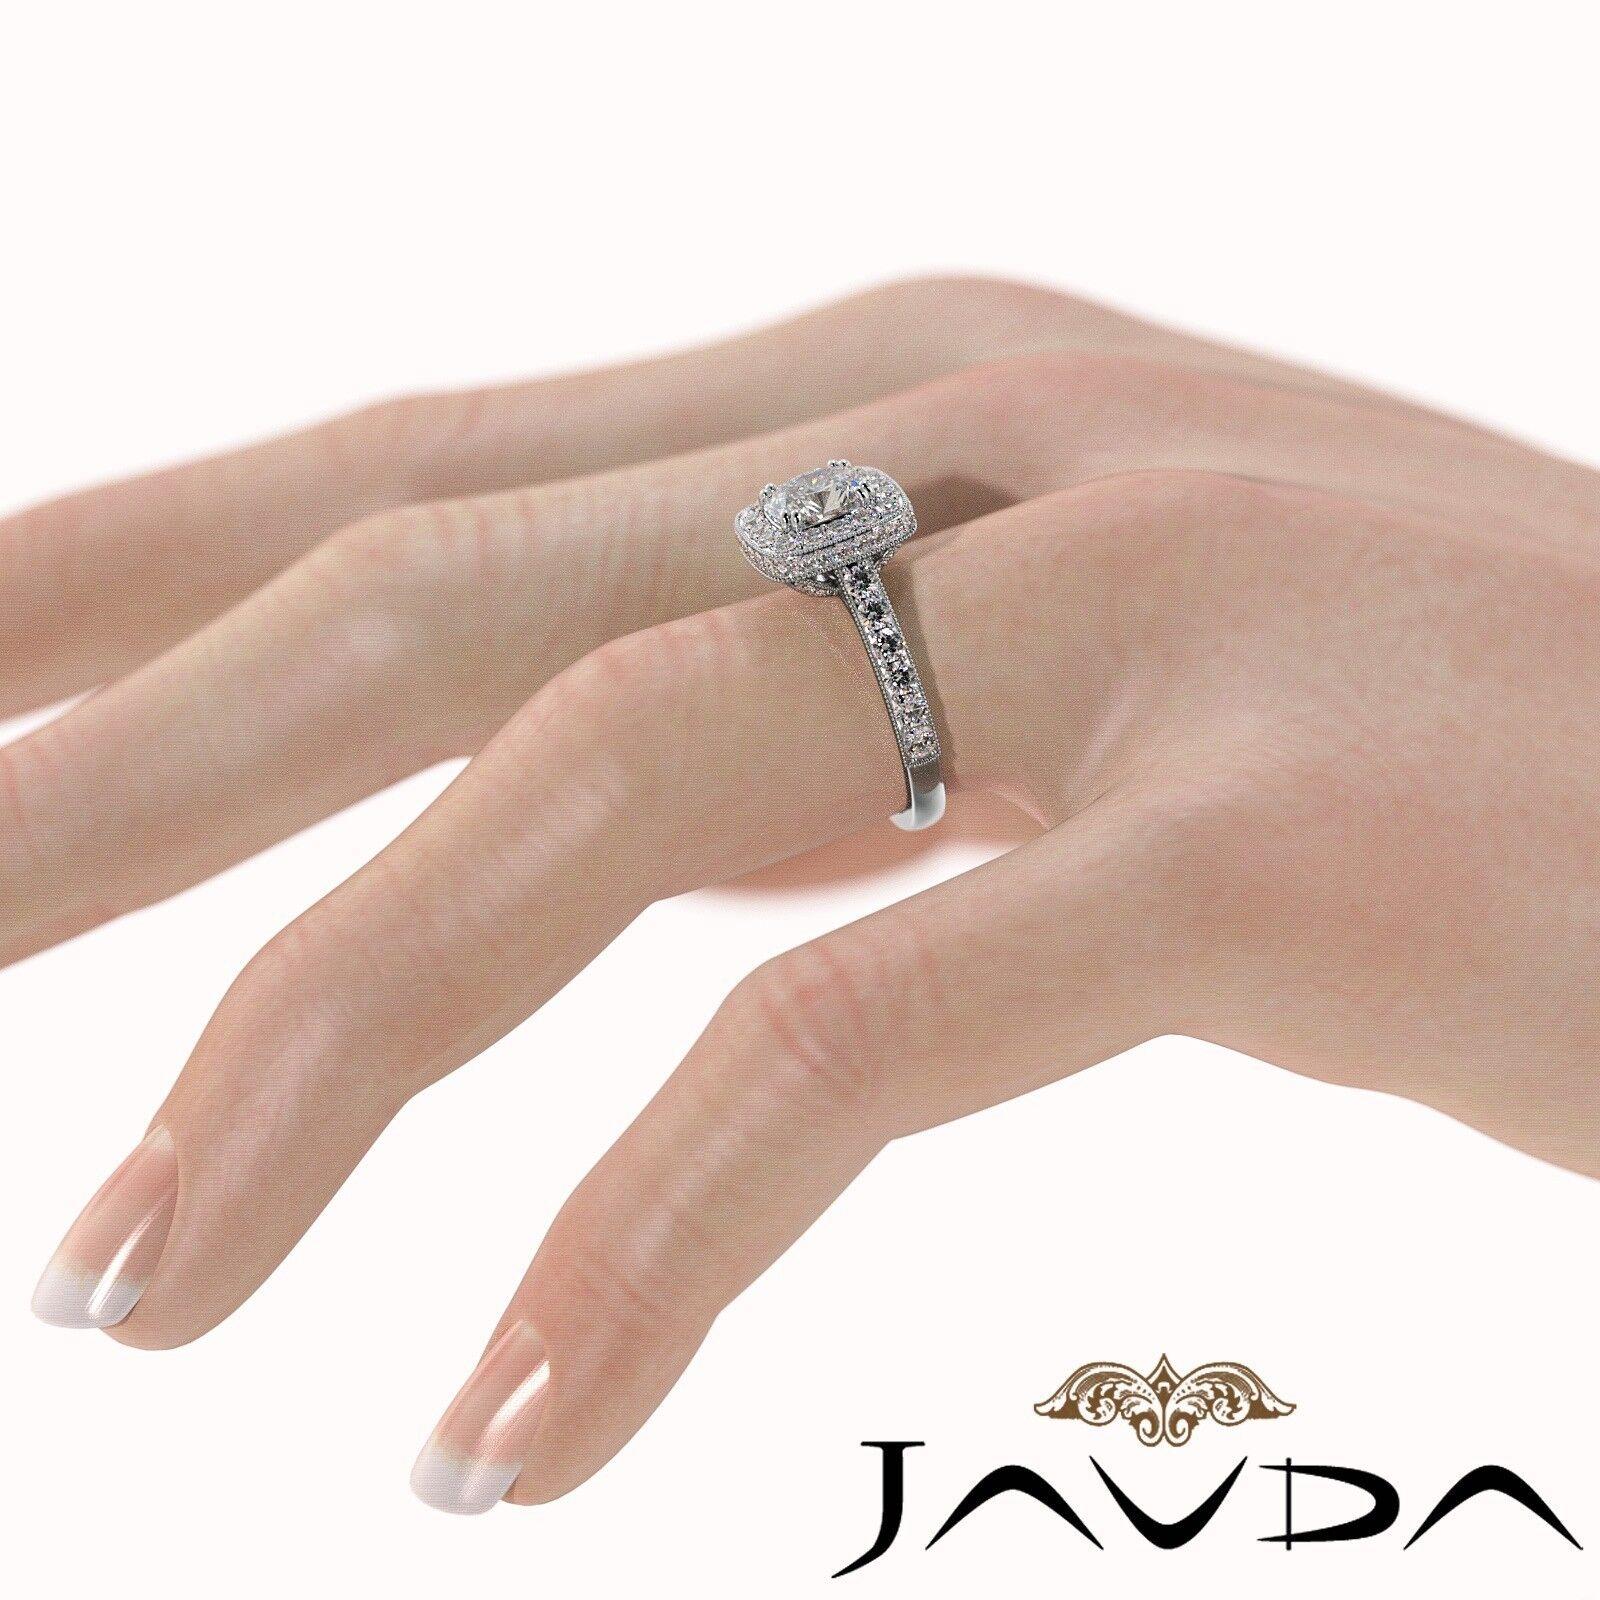 2ctw Milgrain Halo Floral Basket Cushion Diamond Engagement Ring GIA H-VS2 Gold 4